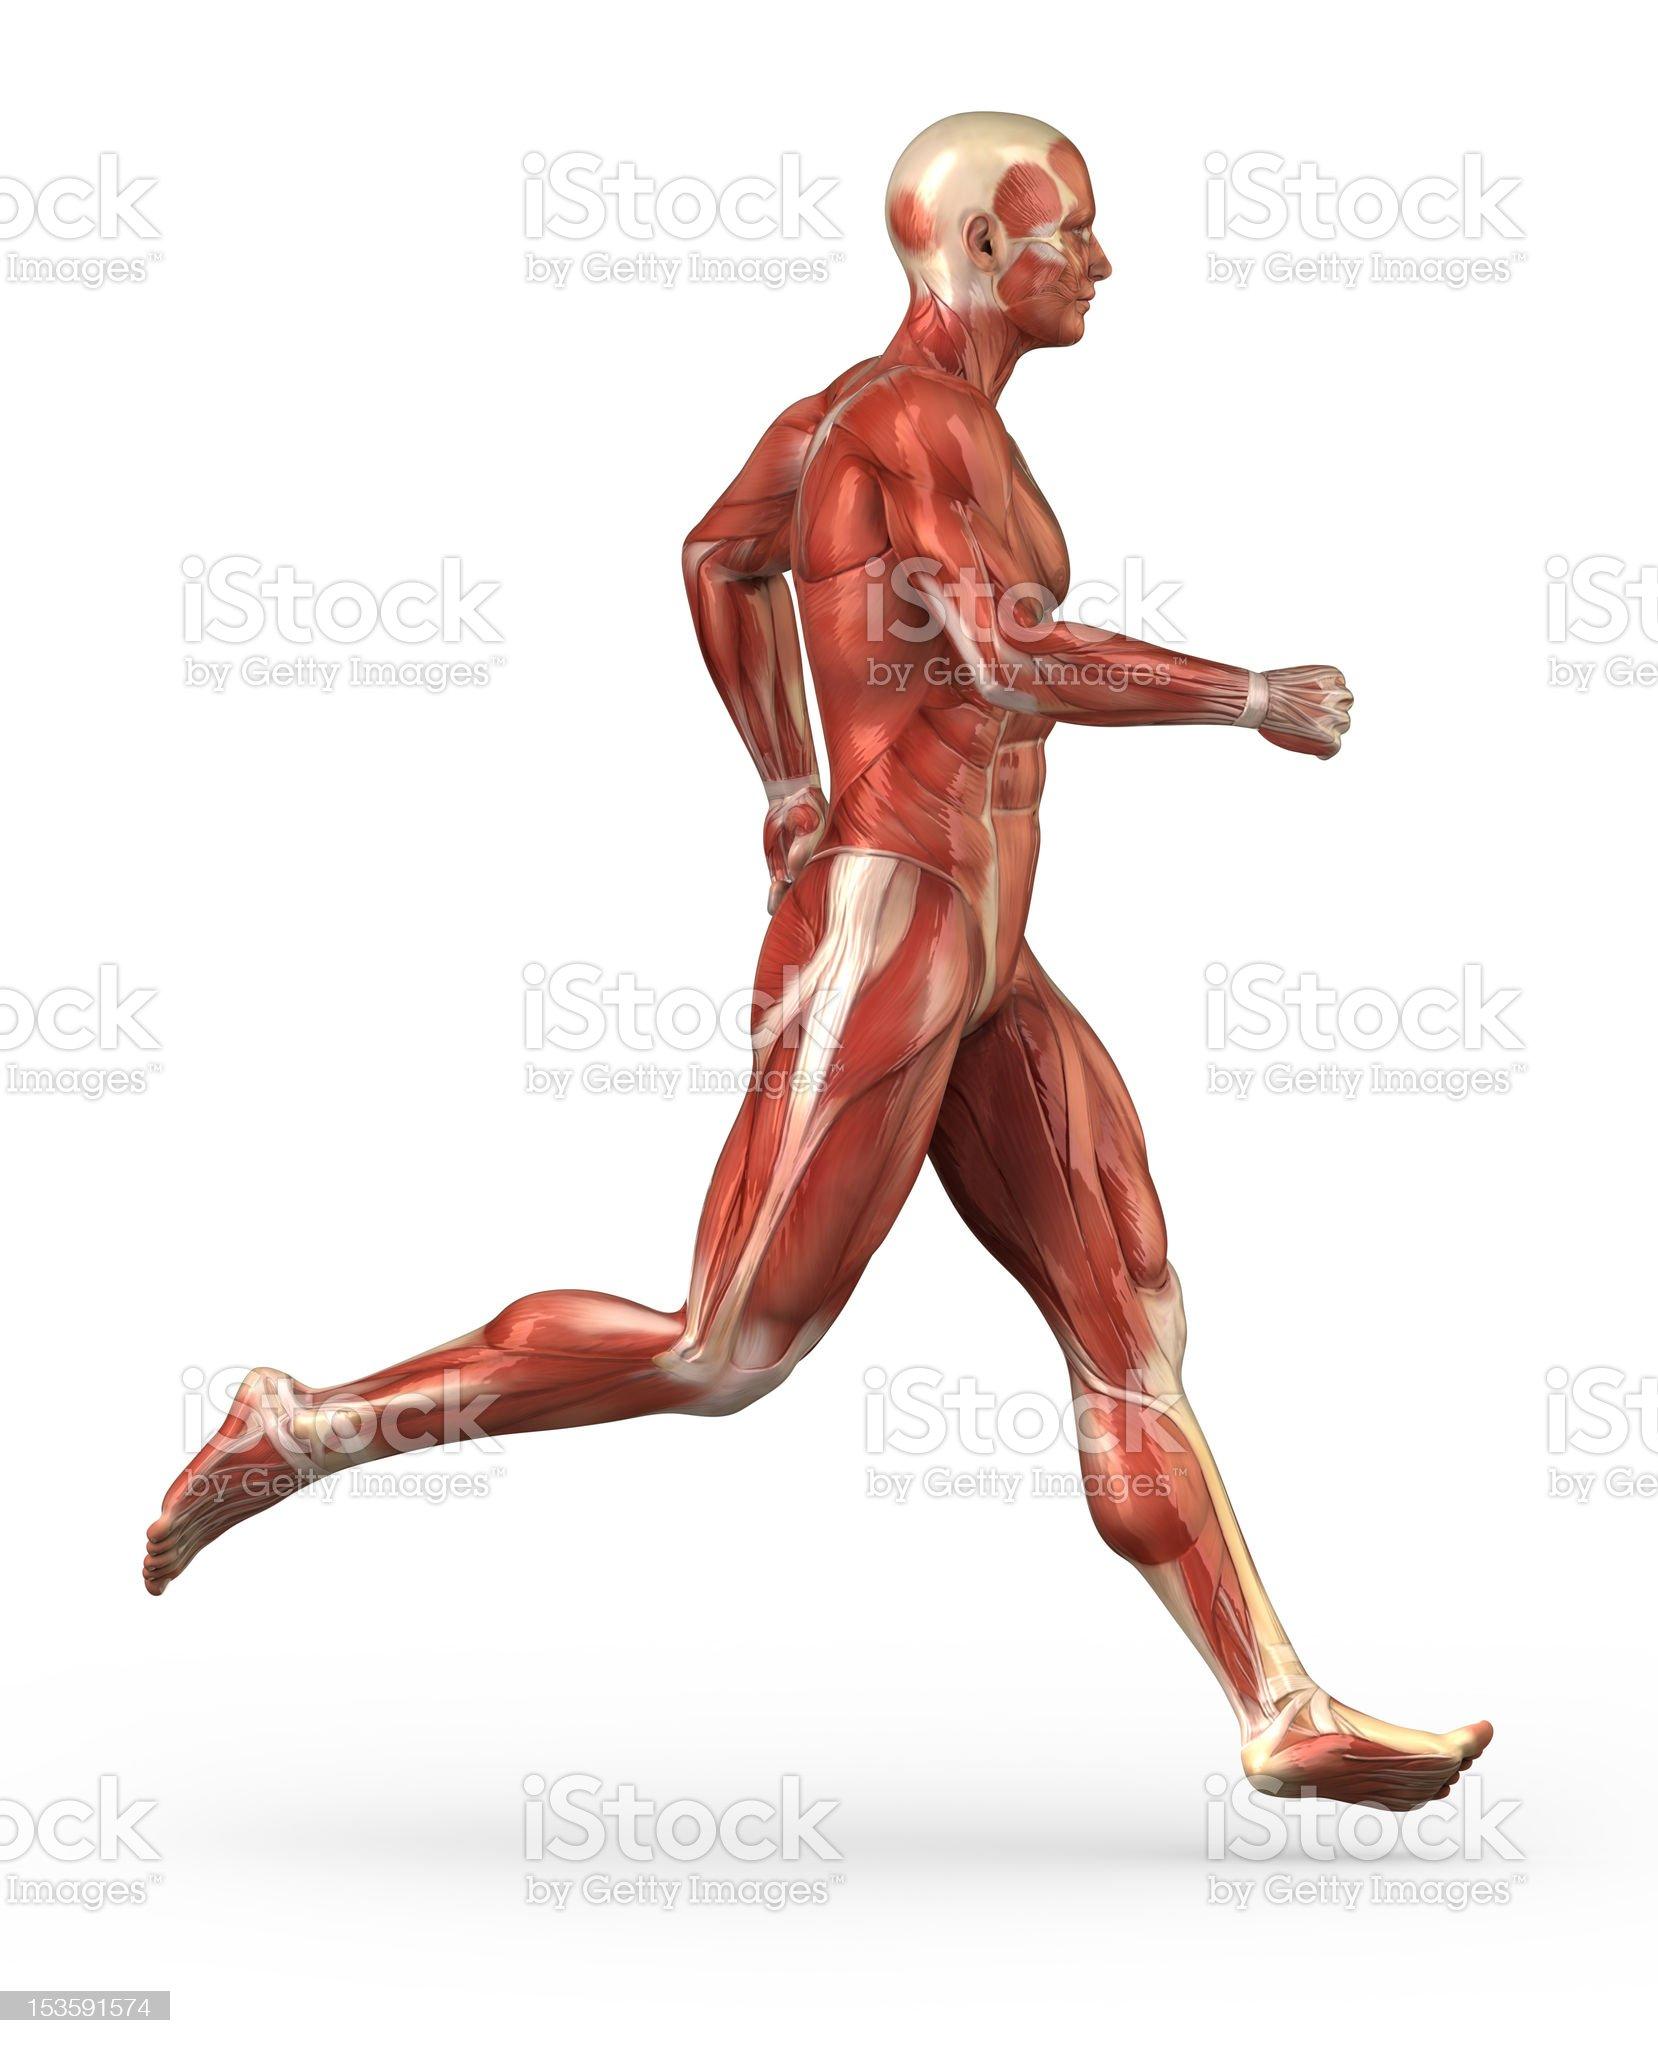 Running man muscular system royalty-free stock photo